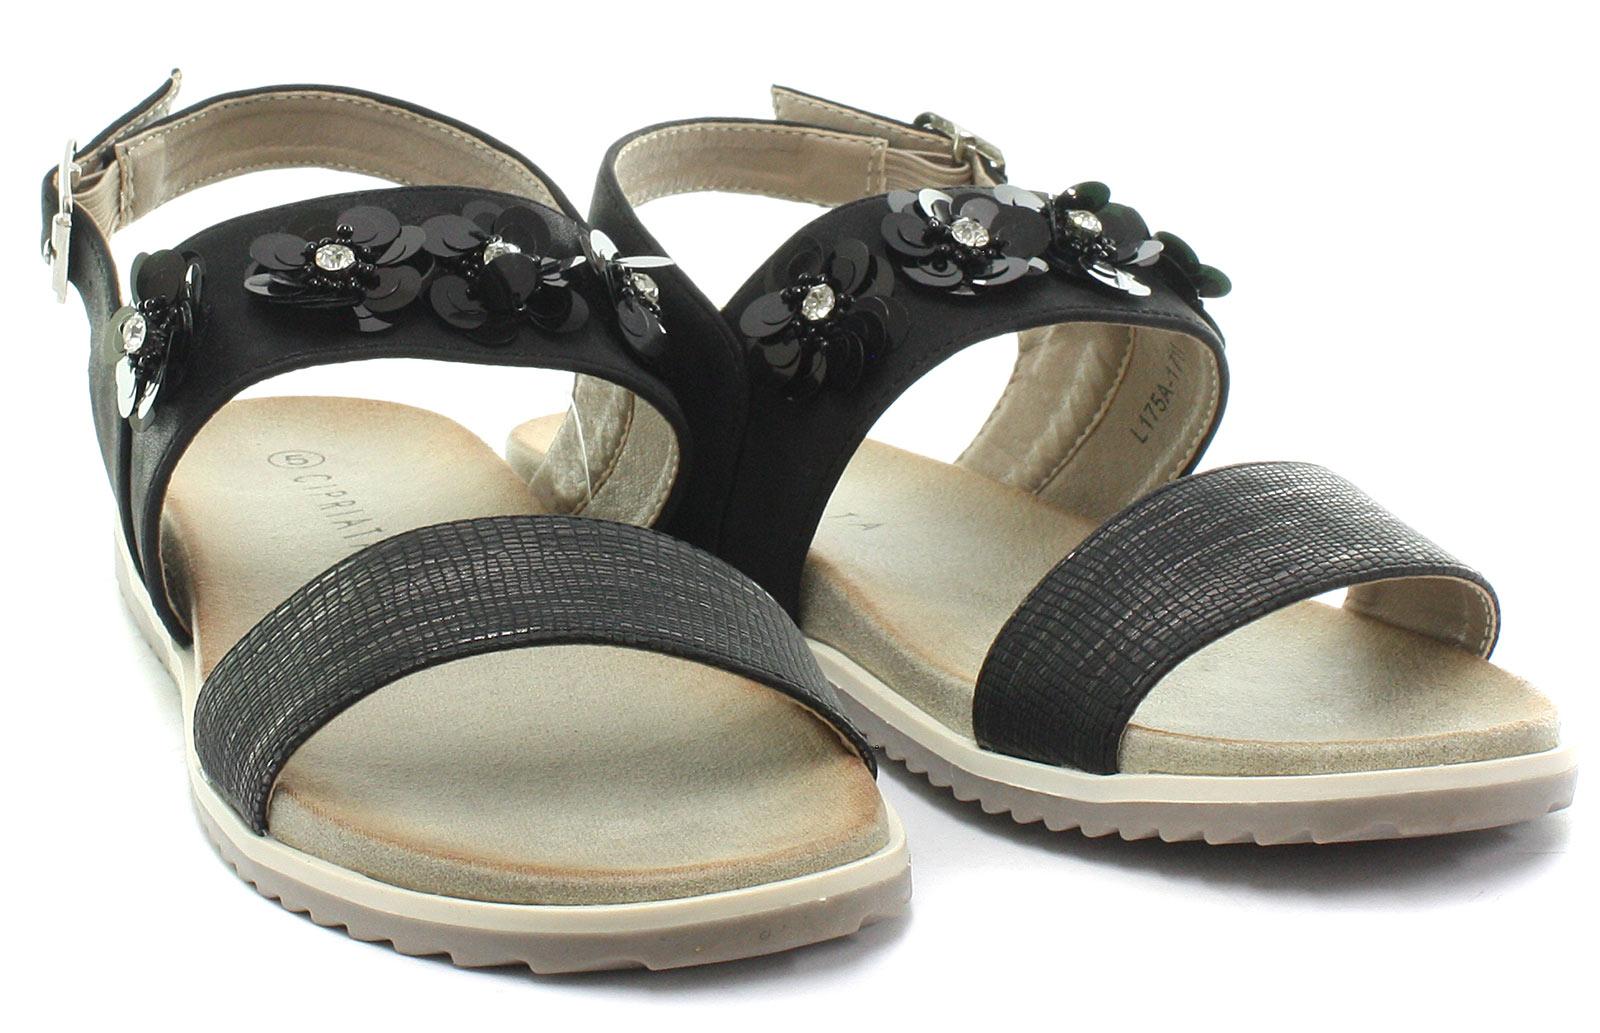 New-Cipriata-Angela-Black-Reptile-Print-Flower-Womens-Sandals-ALL-SIZES miniature 2